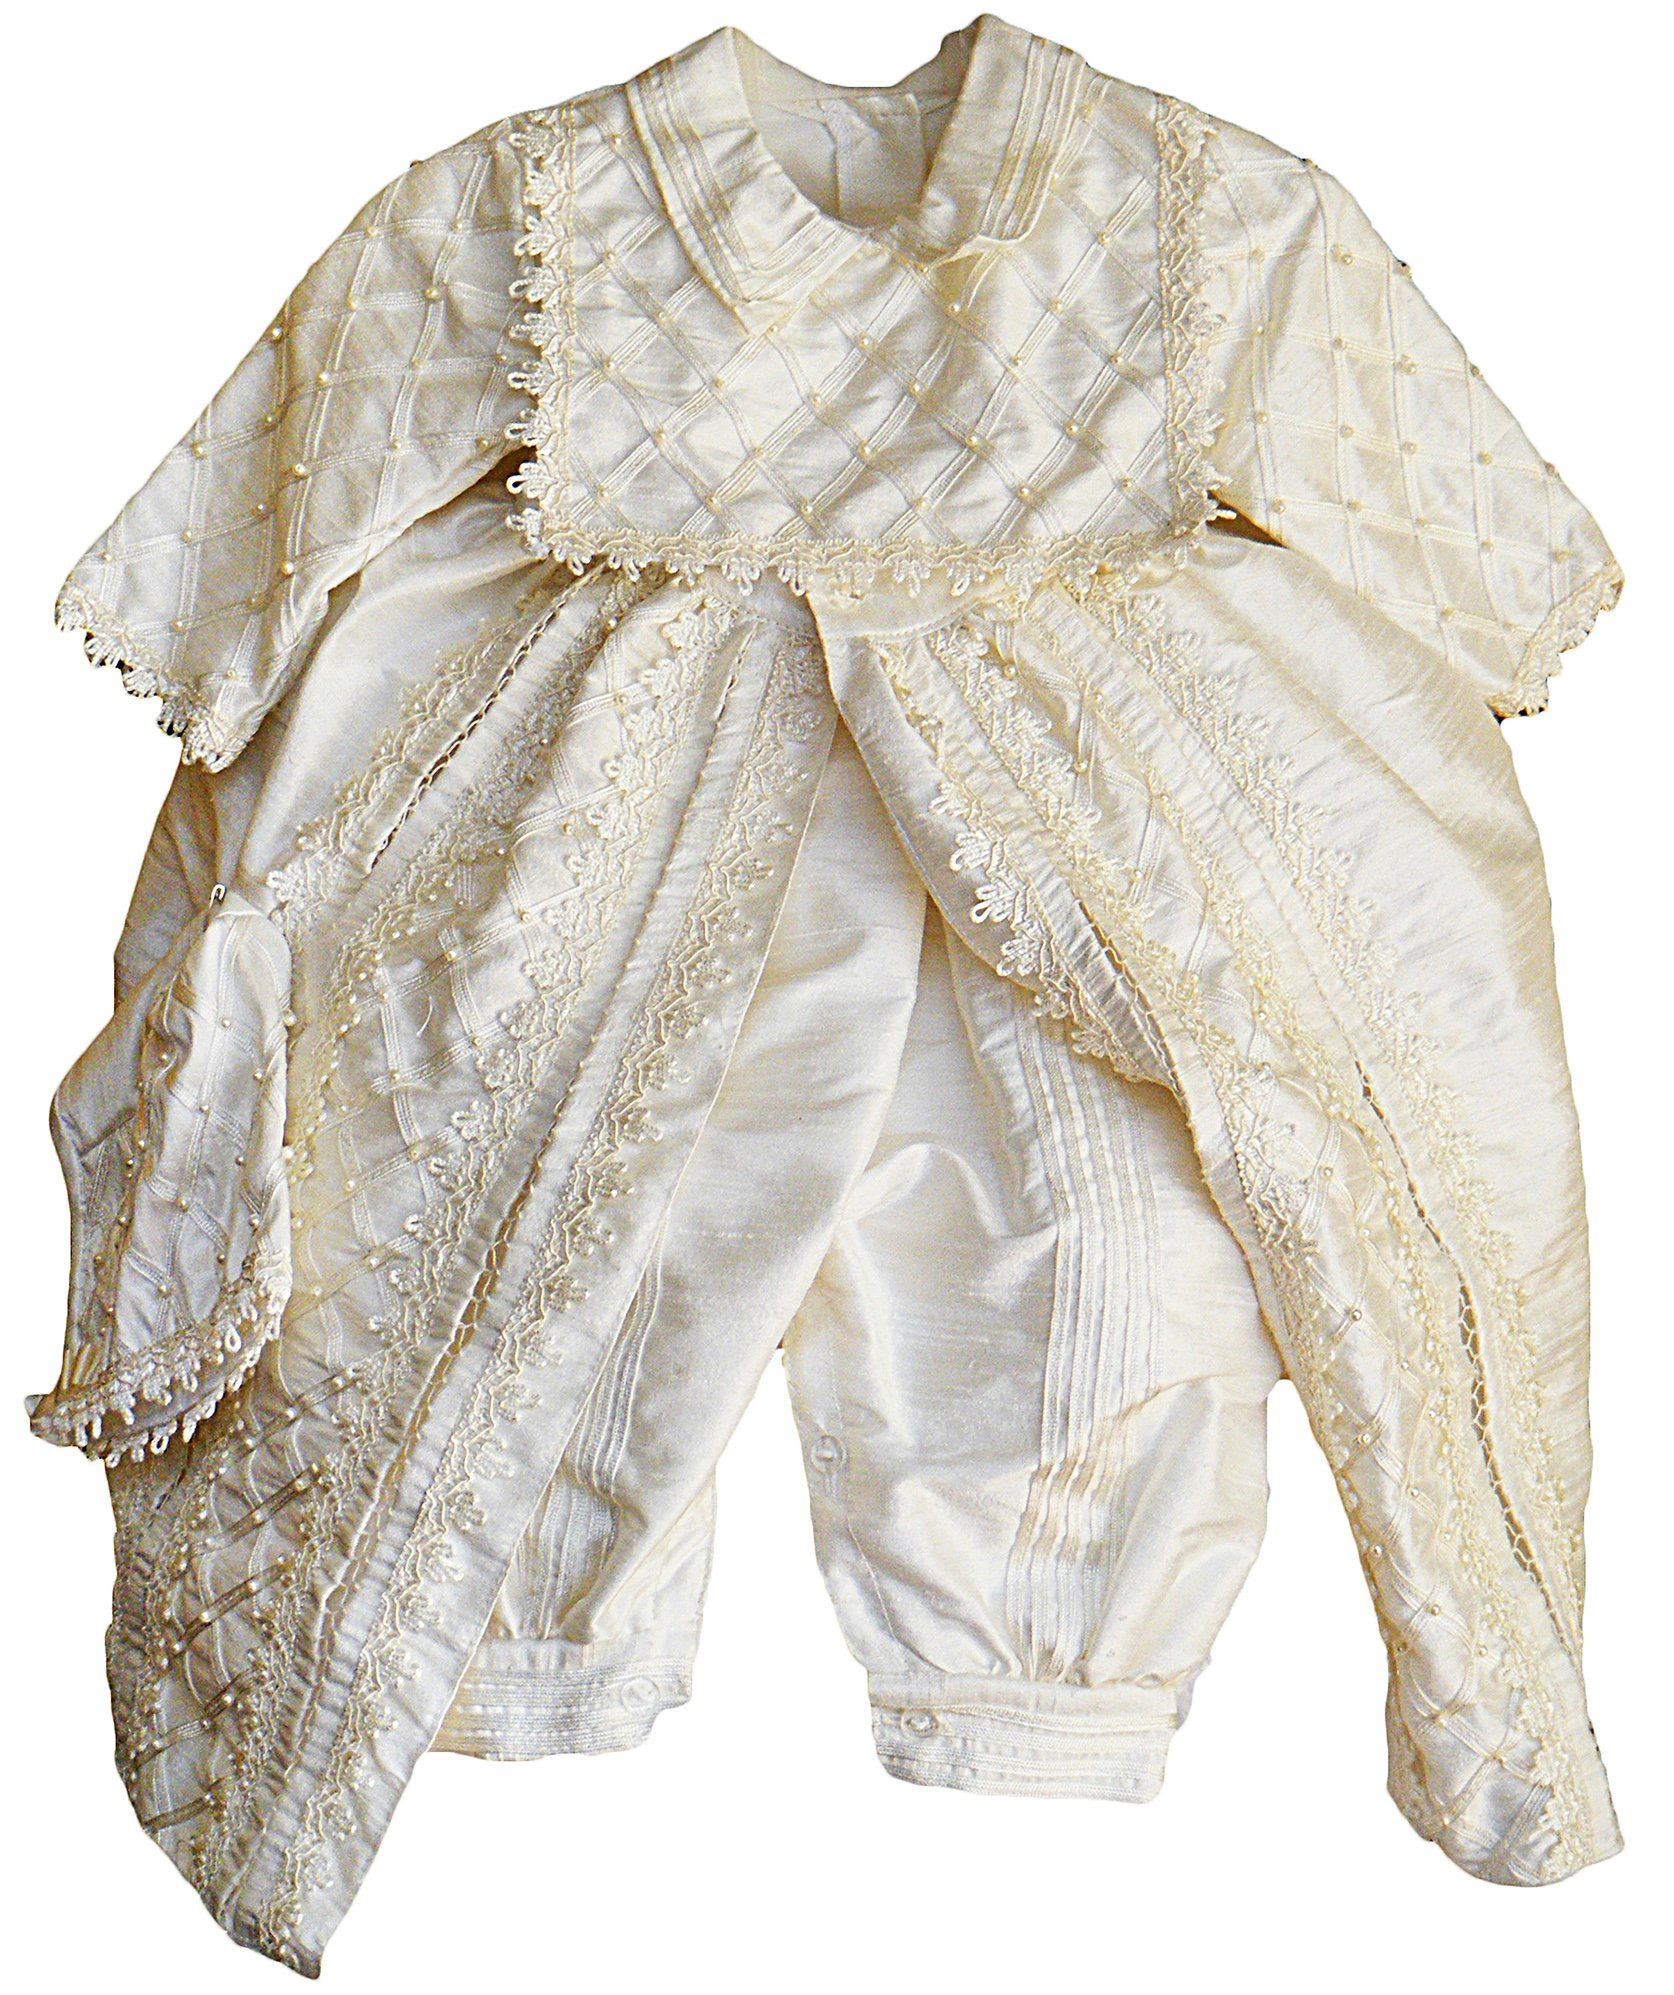 Handmade 100% Silk Christening Baptism Outfit for Boys (Burbvus Ropones)